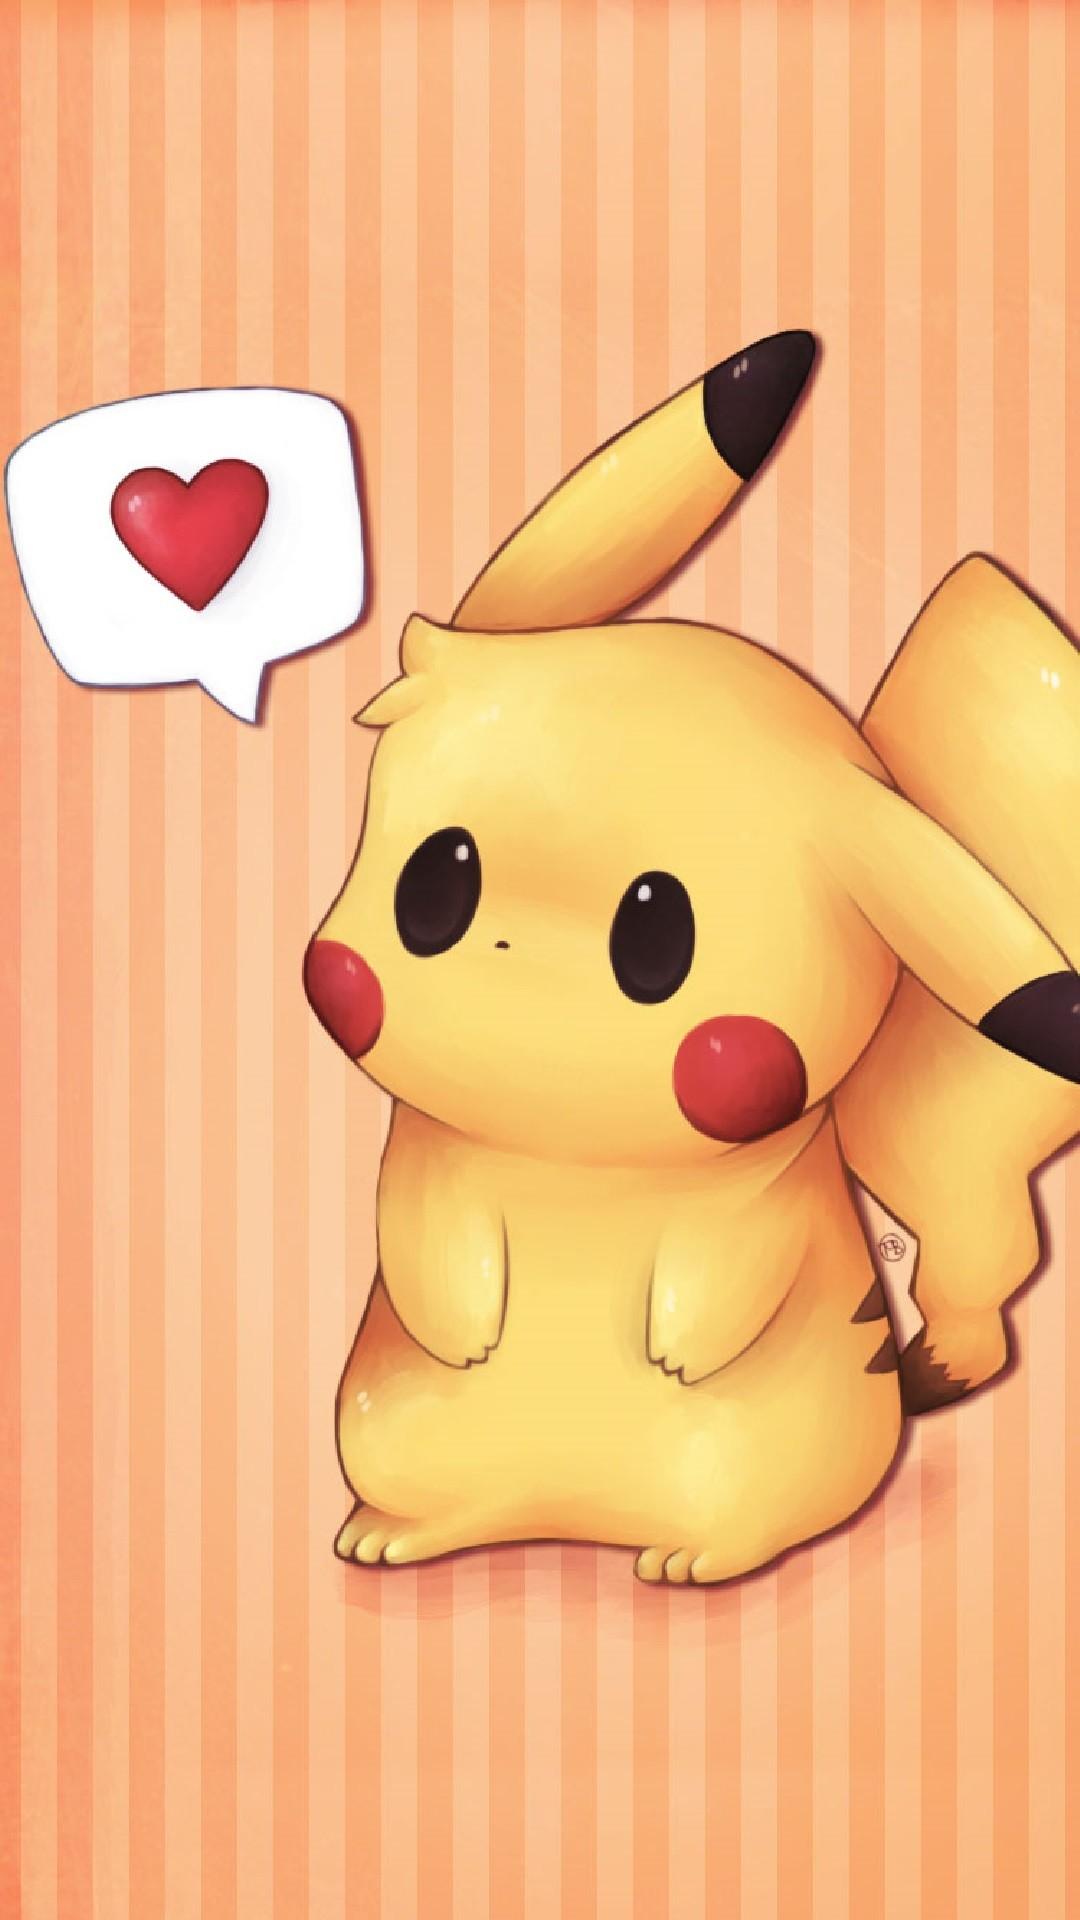 Pokemon Go Pikachu say love Iphone hd wallpaper